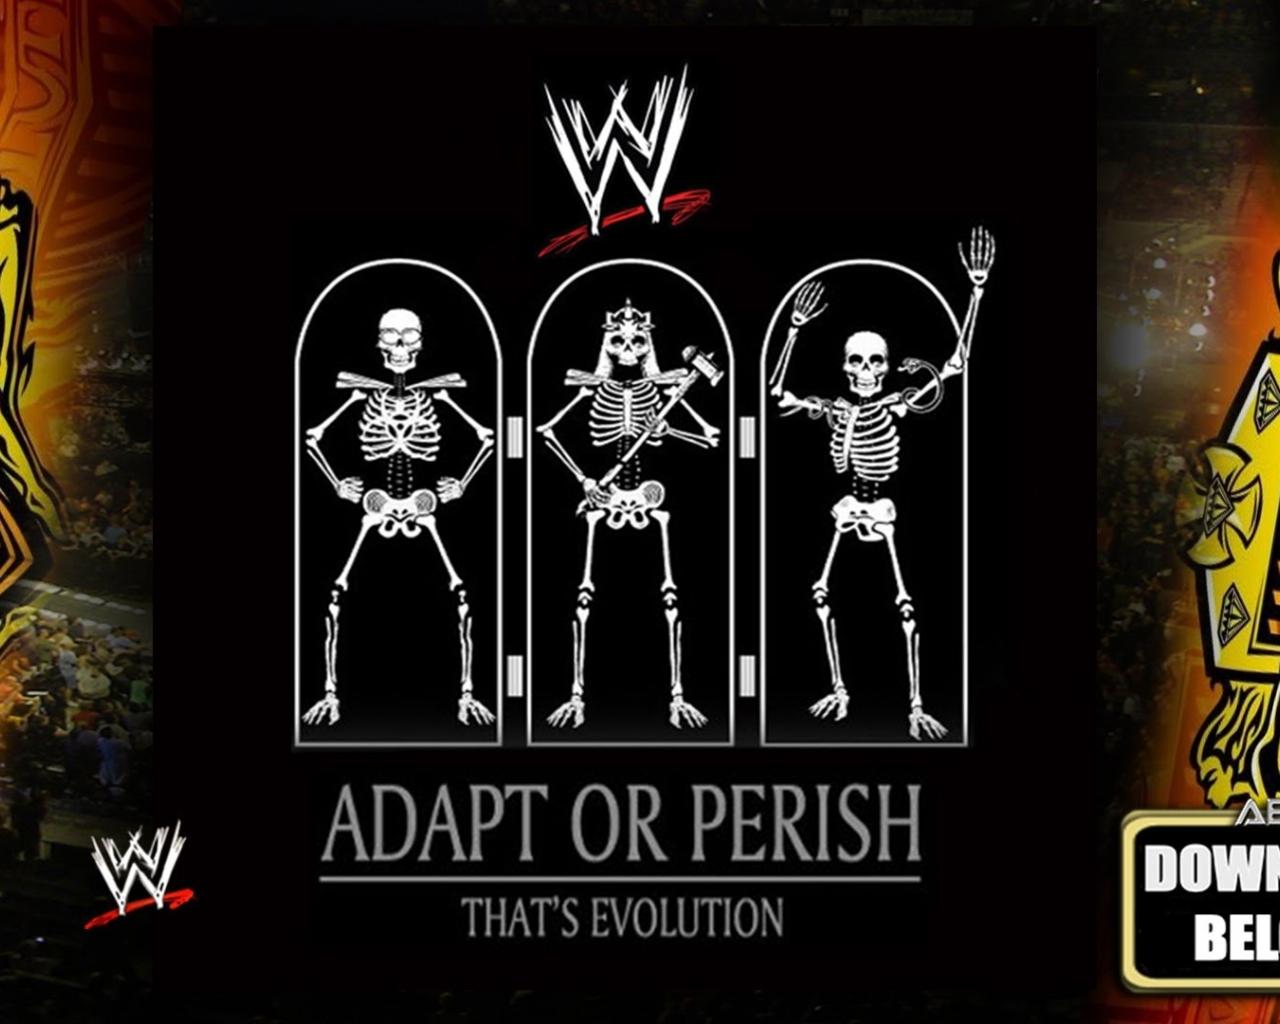 Download WWE Evolution [Adapt Or Perish] Arena Effect [Full Album 1280x1024